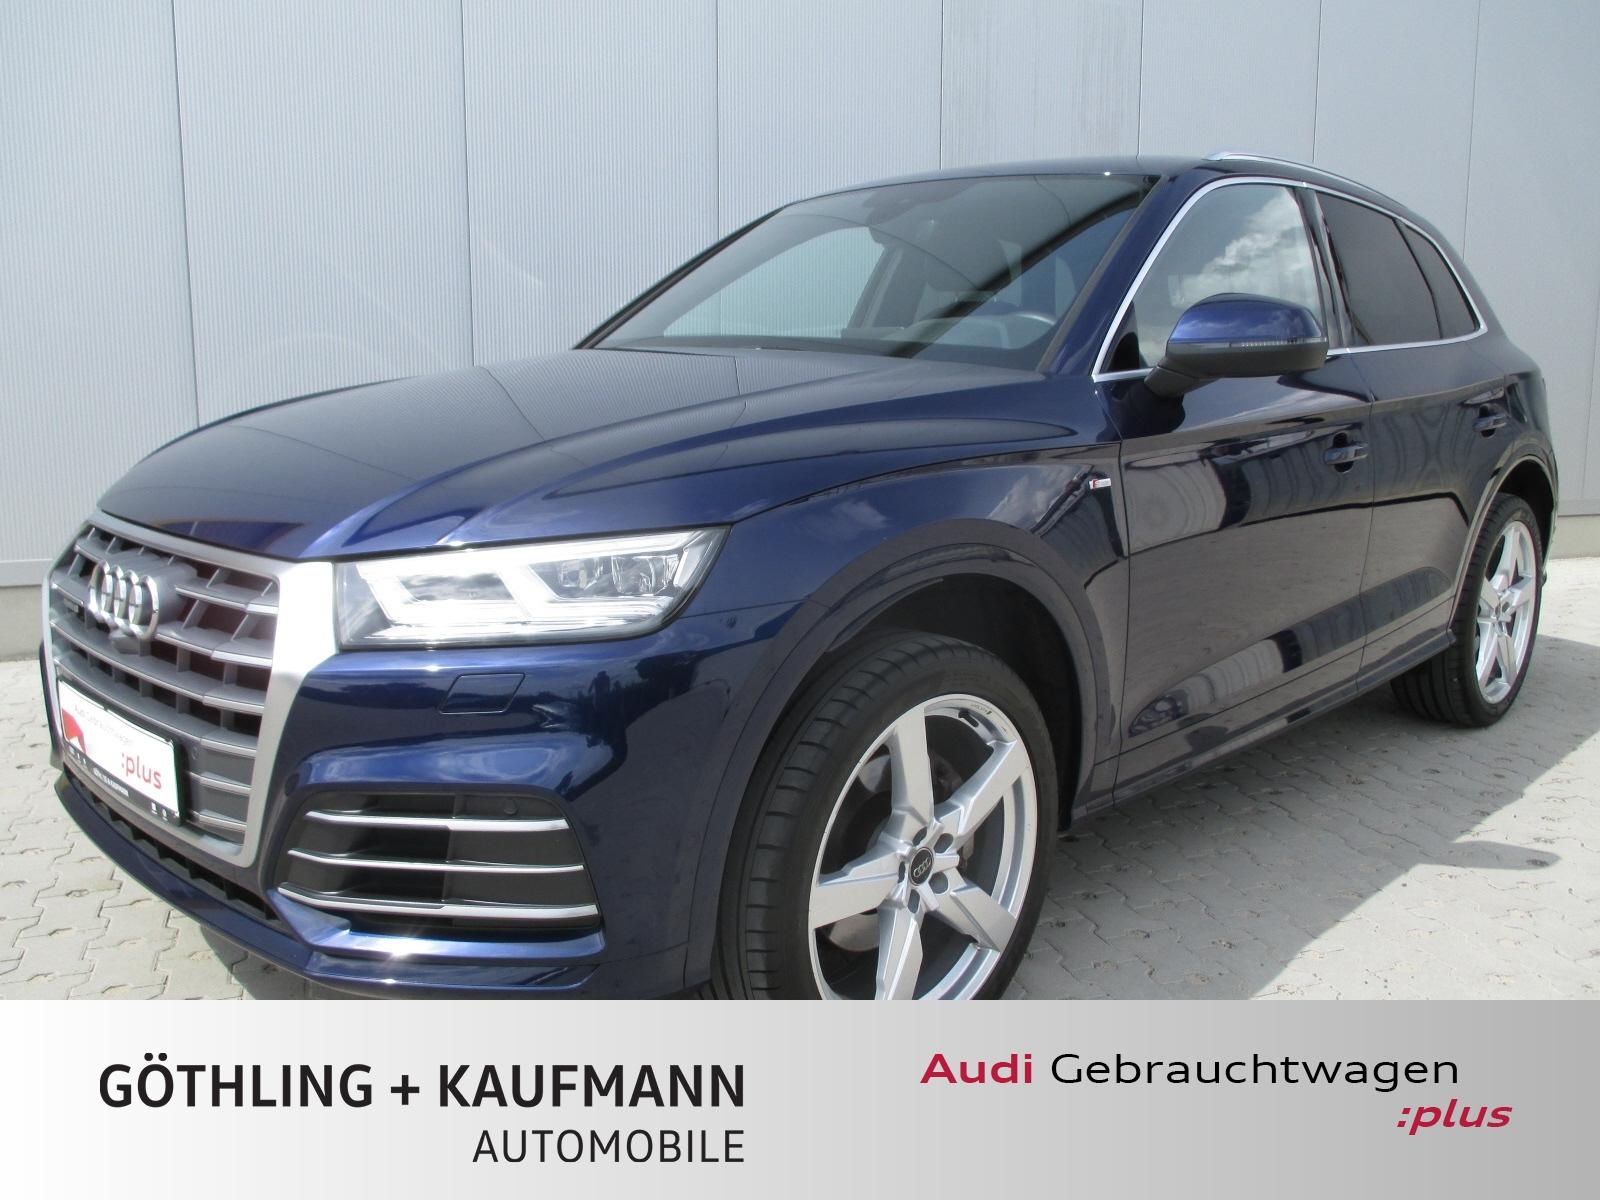 Audi Q5 2.0 TDI qu S line S tro. 140kW*Standh.*Kamera, Jahr 2017, Diesel